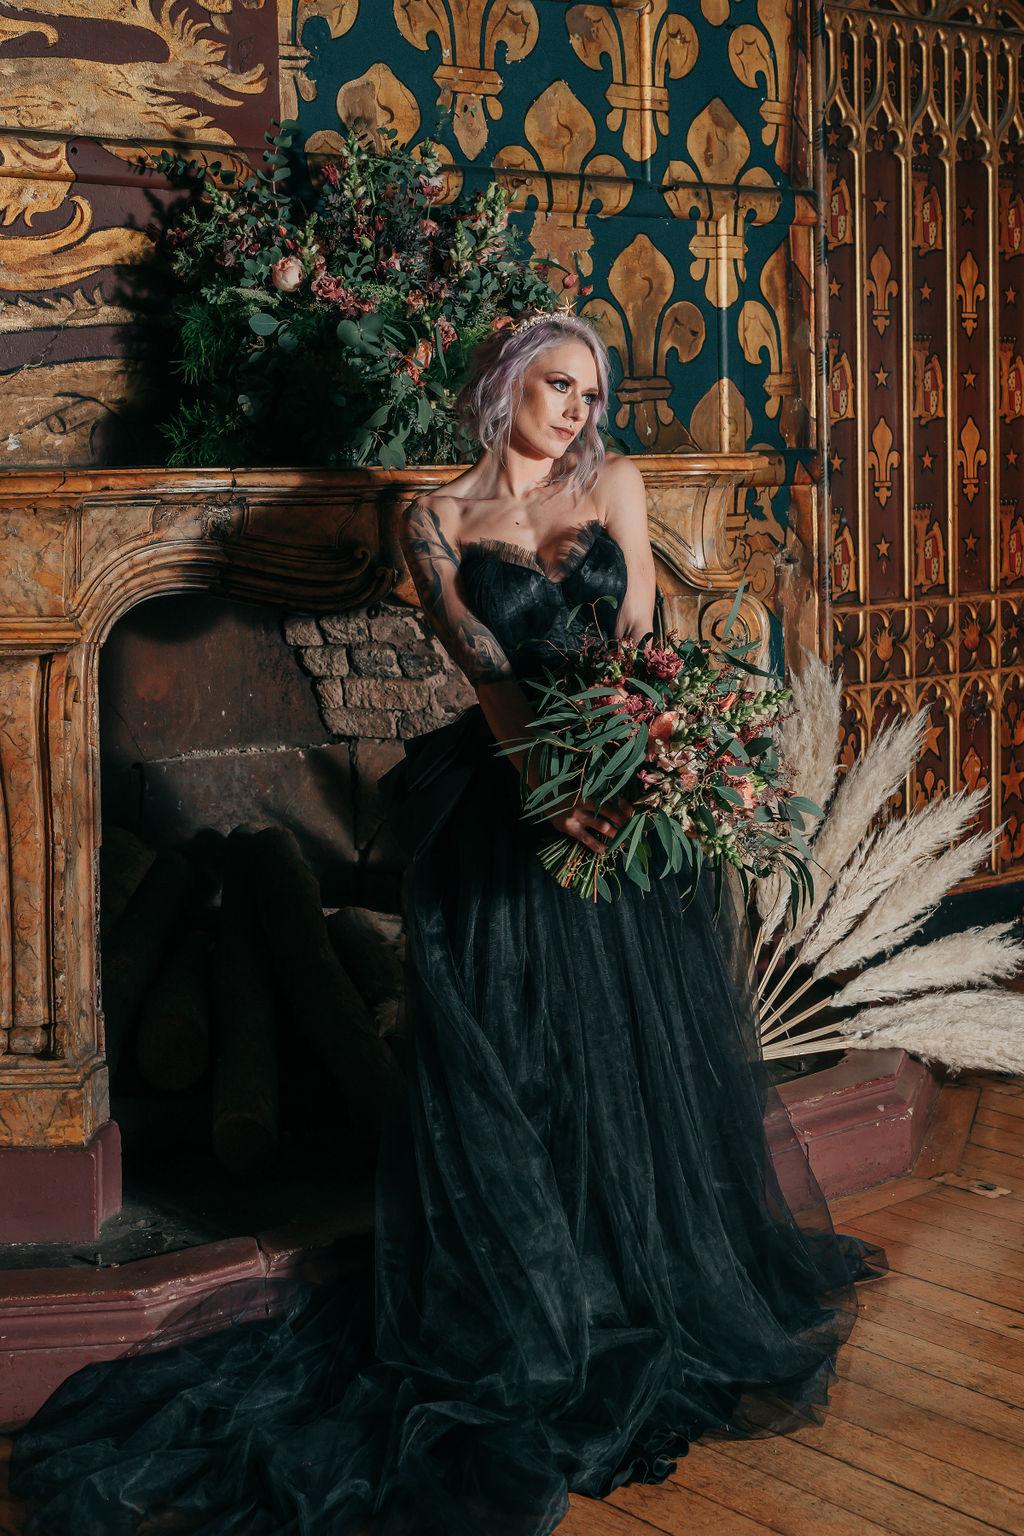 black wedding dress - alternative wedding dress - unique bridal look